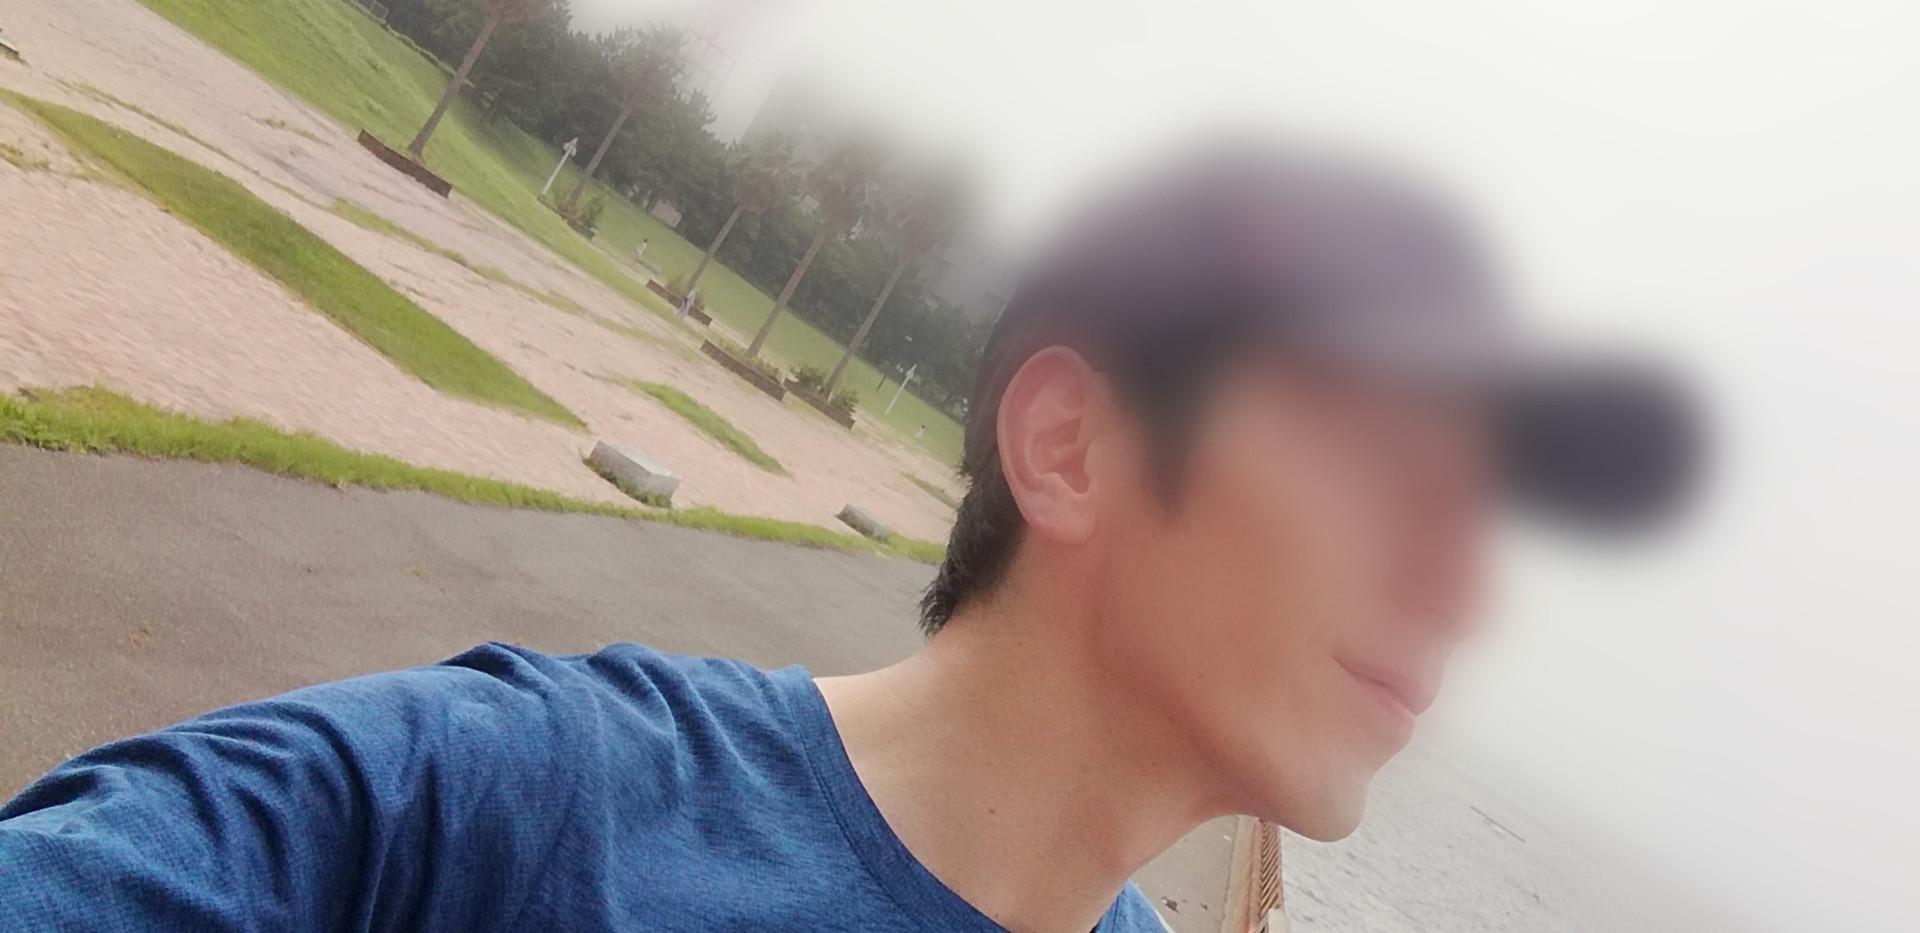 IMG_20190819_161610.jpg